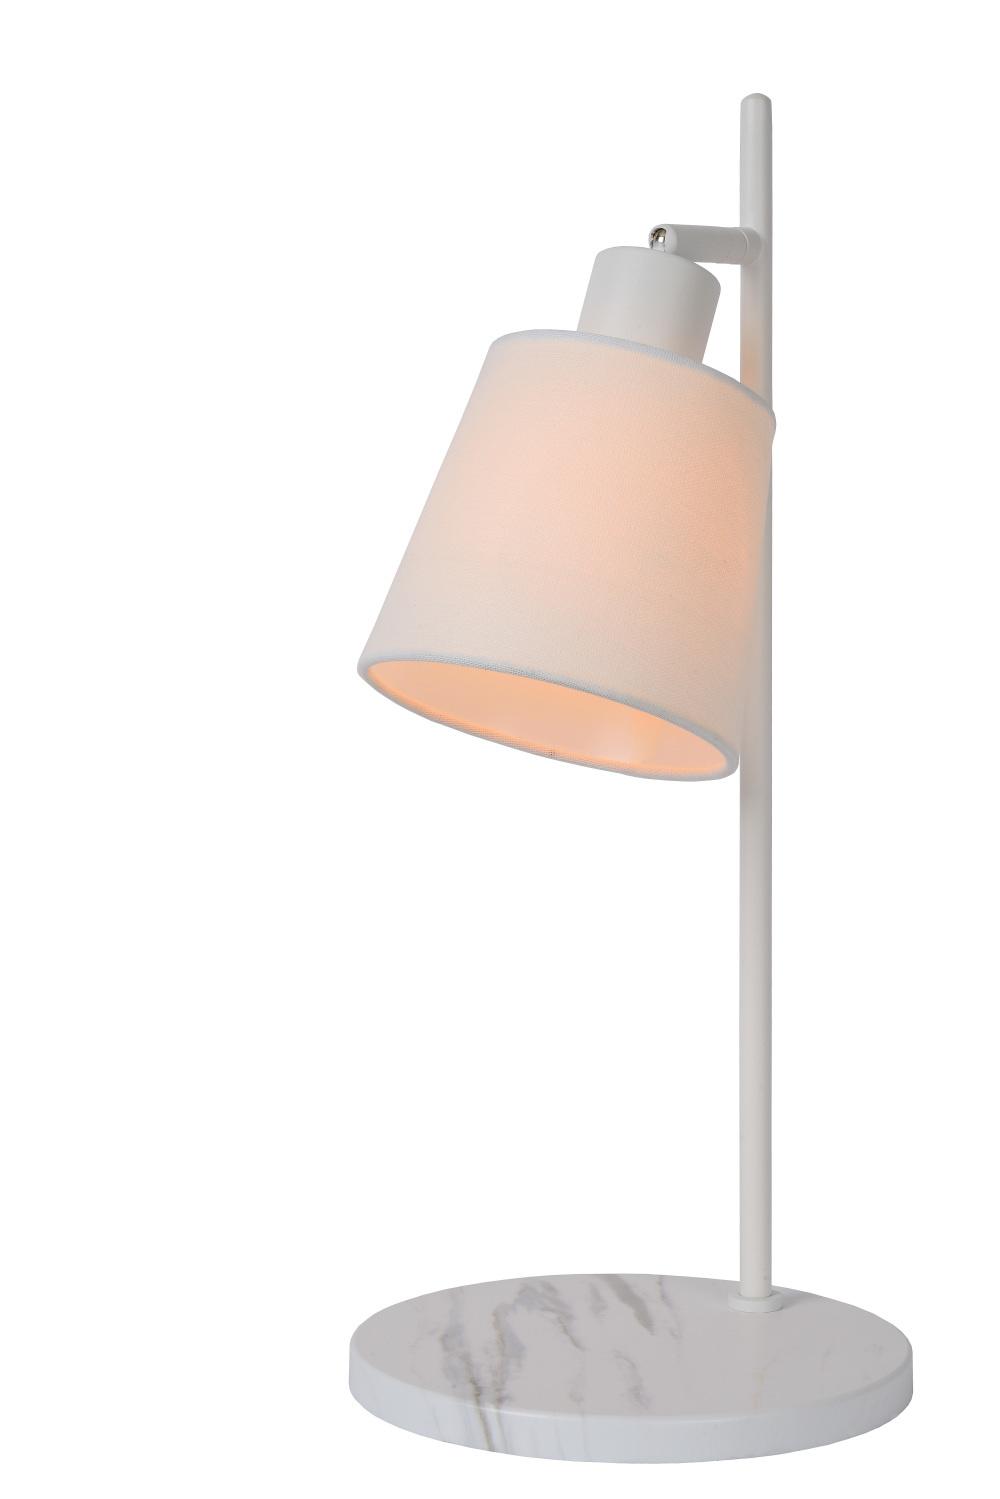 Lucide PIPPA Tafellamp-Wit-1xE27-25W-Metaal